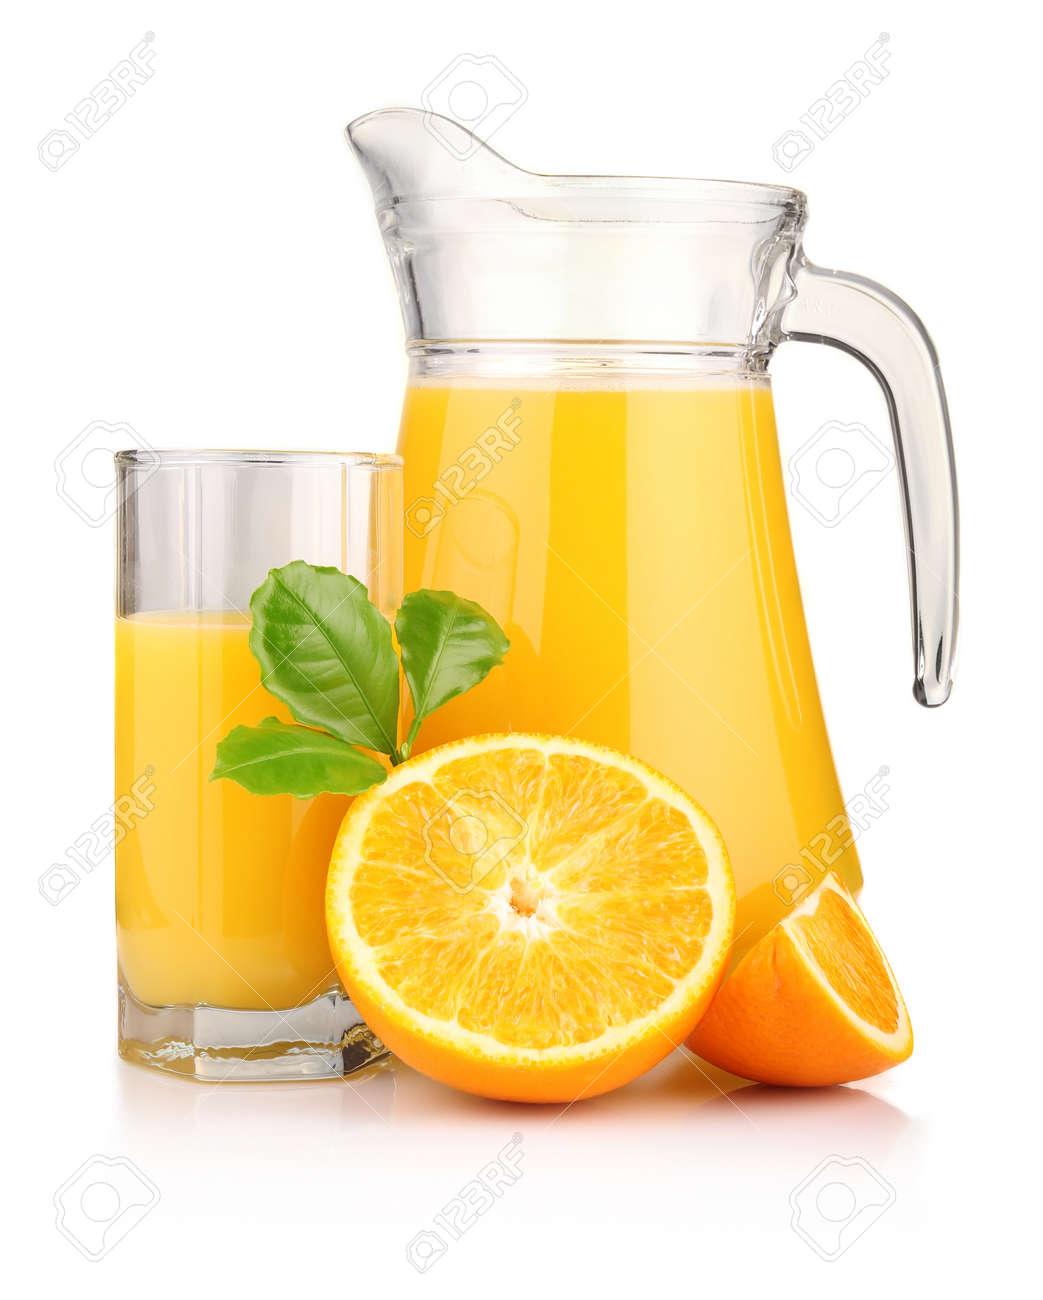 Jug, glass of orange juice and orange fruits with green leaves isolated on white Stock Photo - 9018838